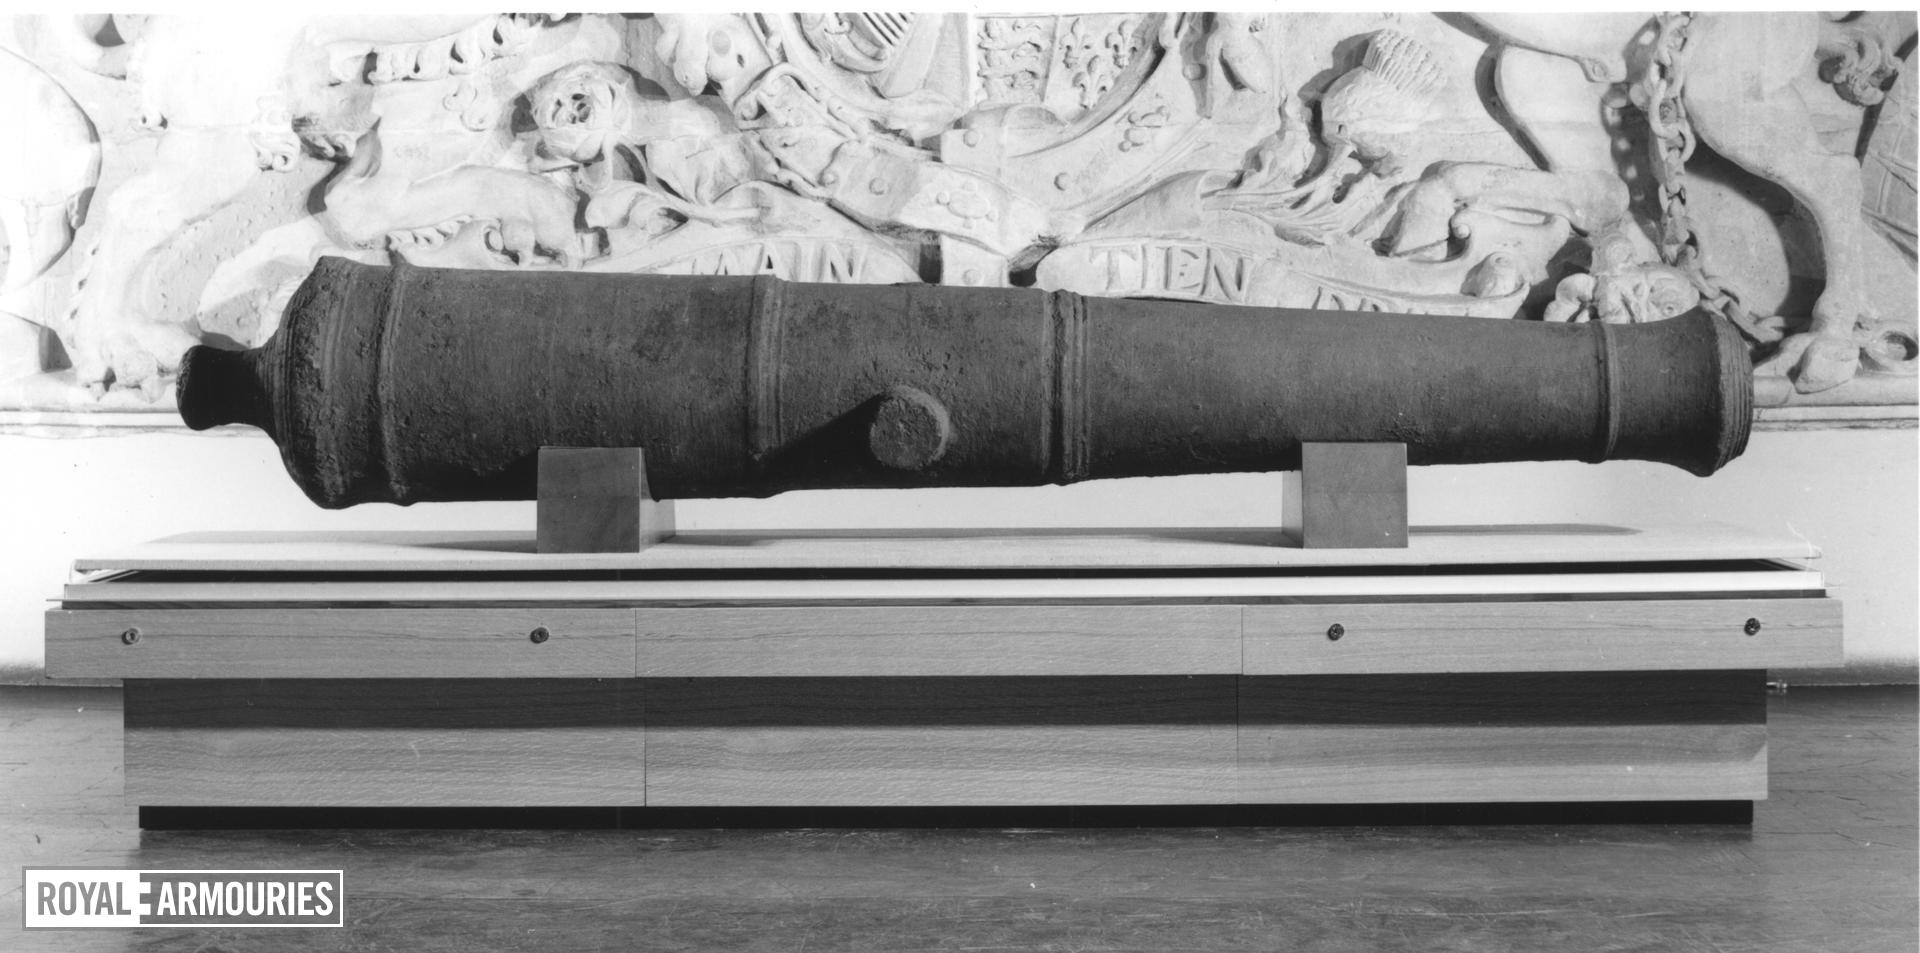 4.5 in demi-culverin - The Commonwealth gun The Commonwealth gun